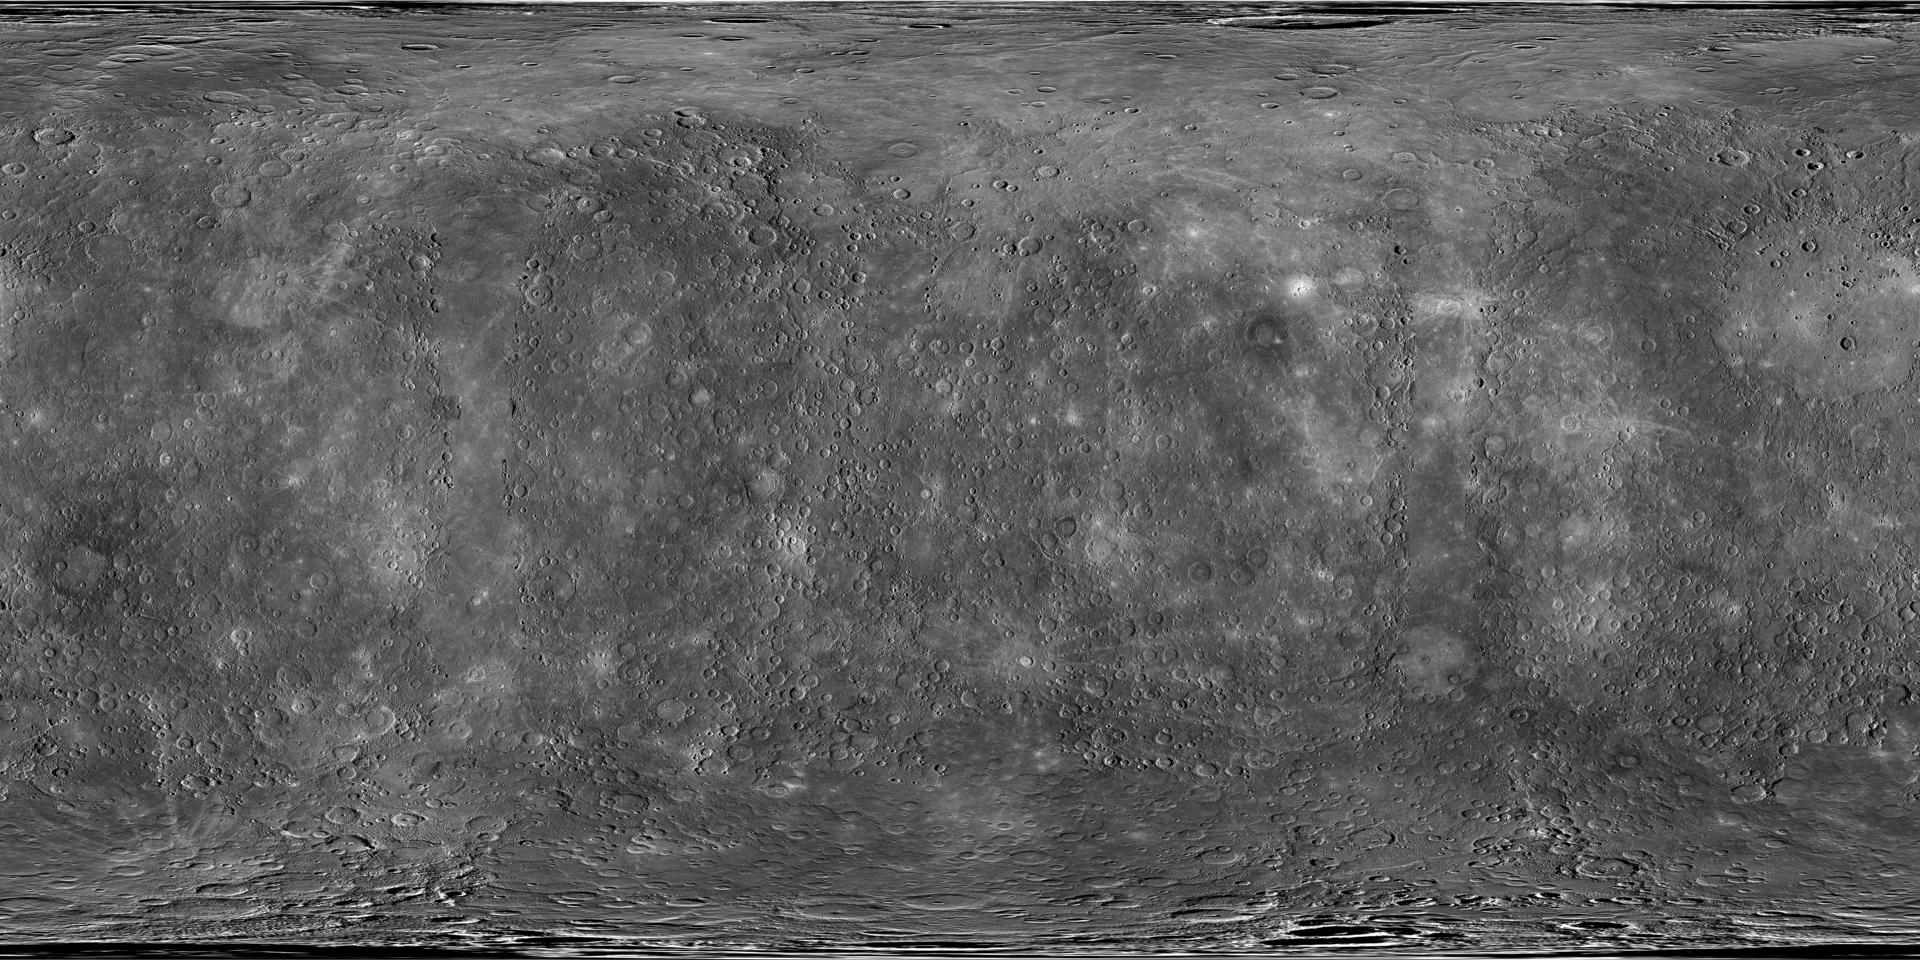 Mercury (planet) - Wikimedia Commons